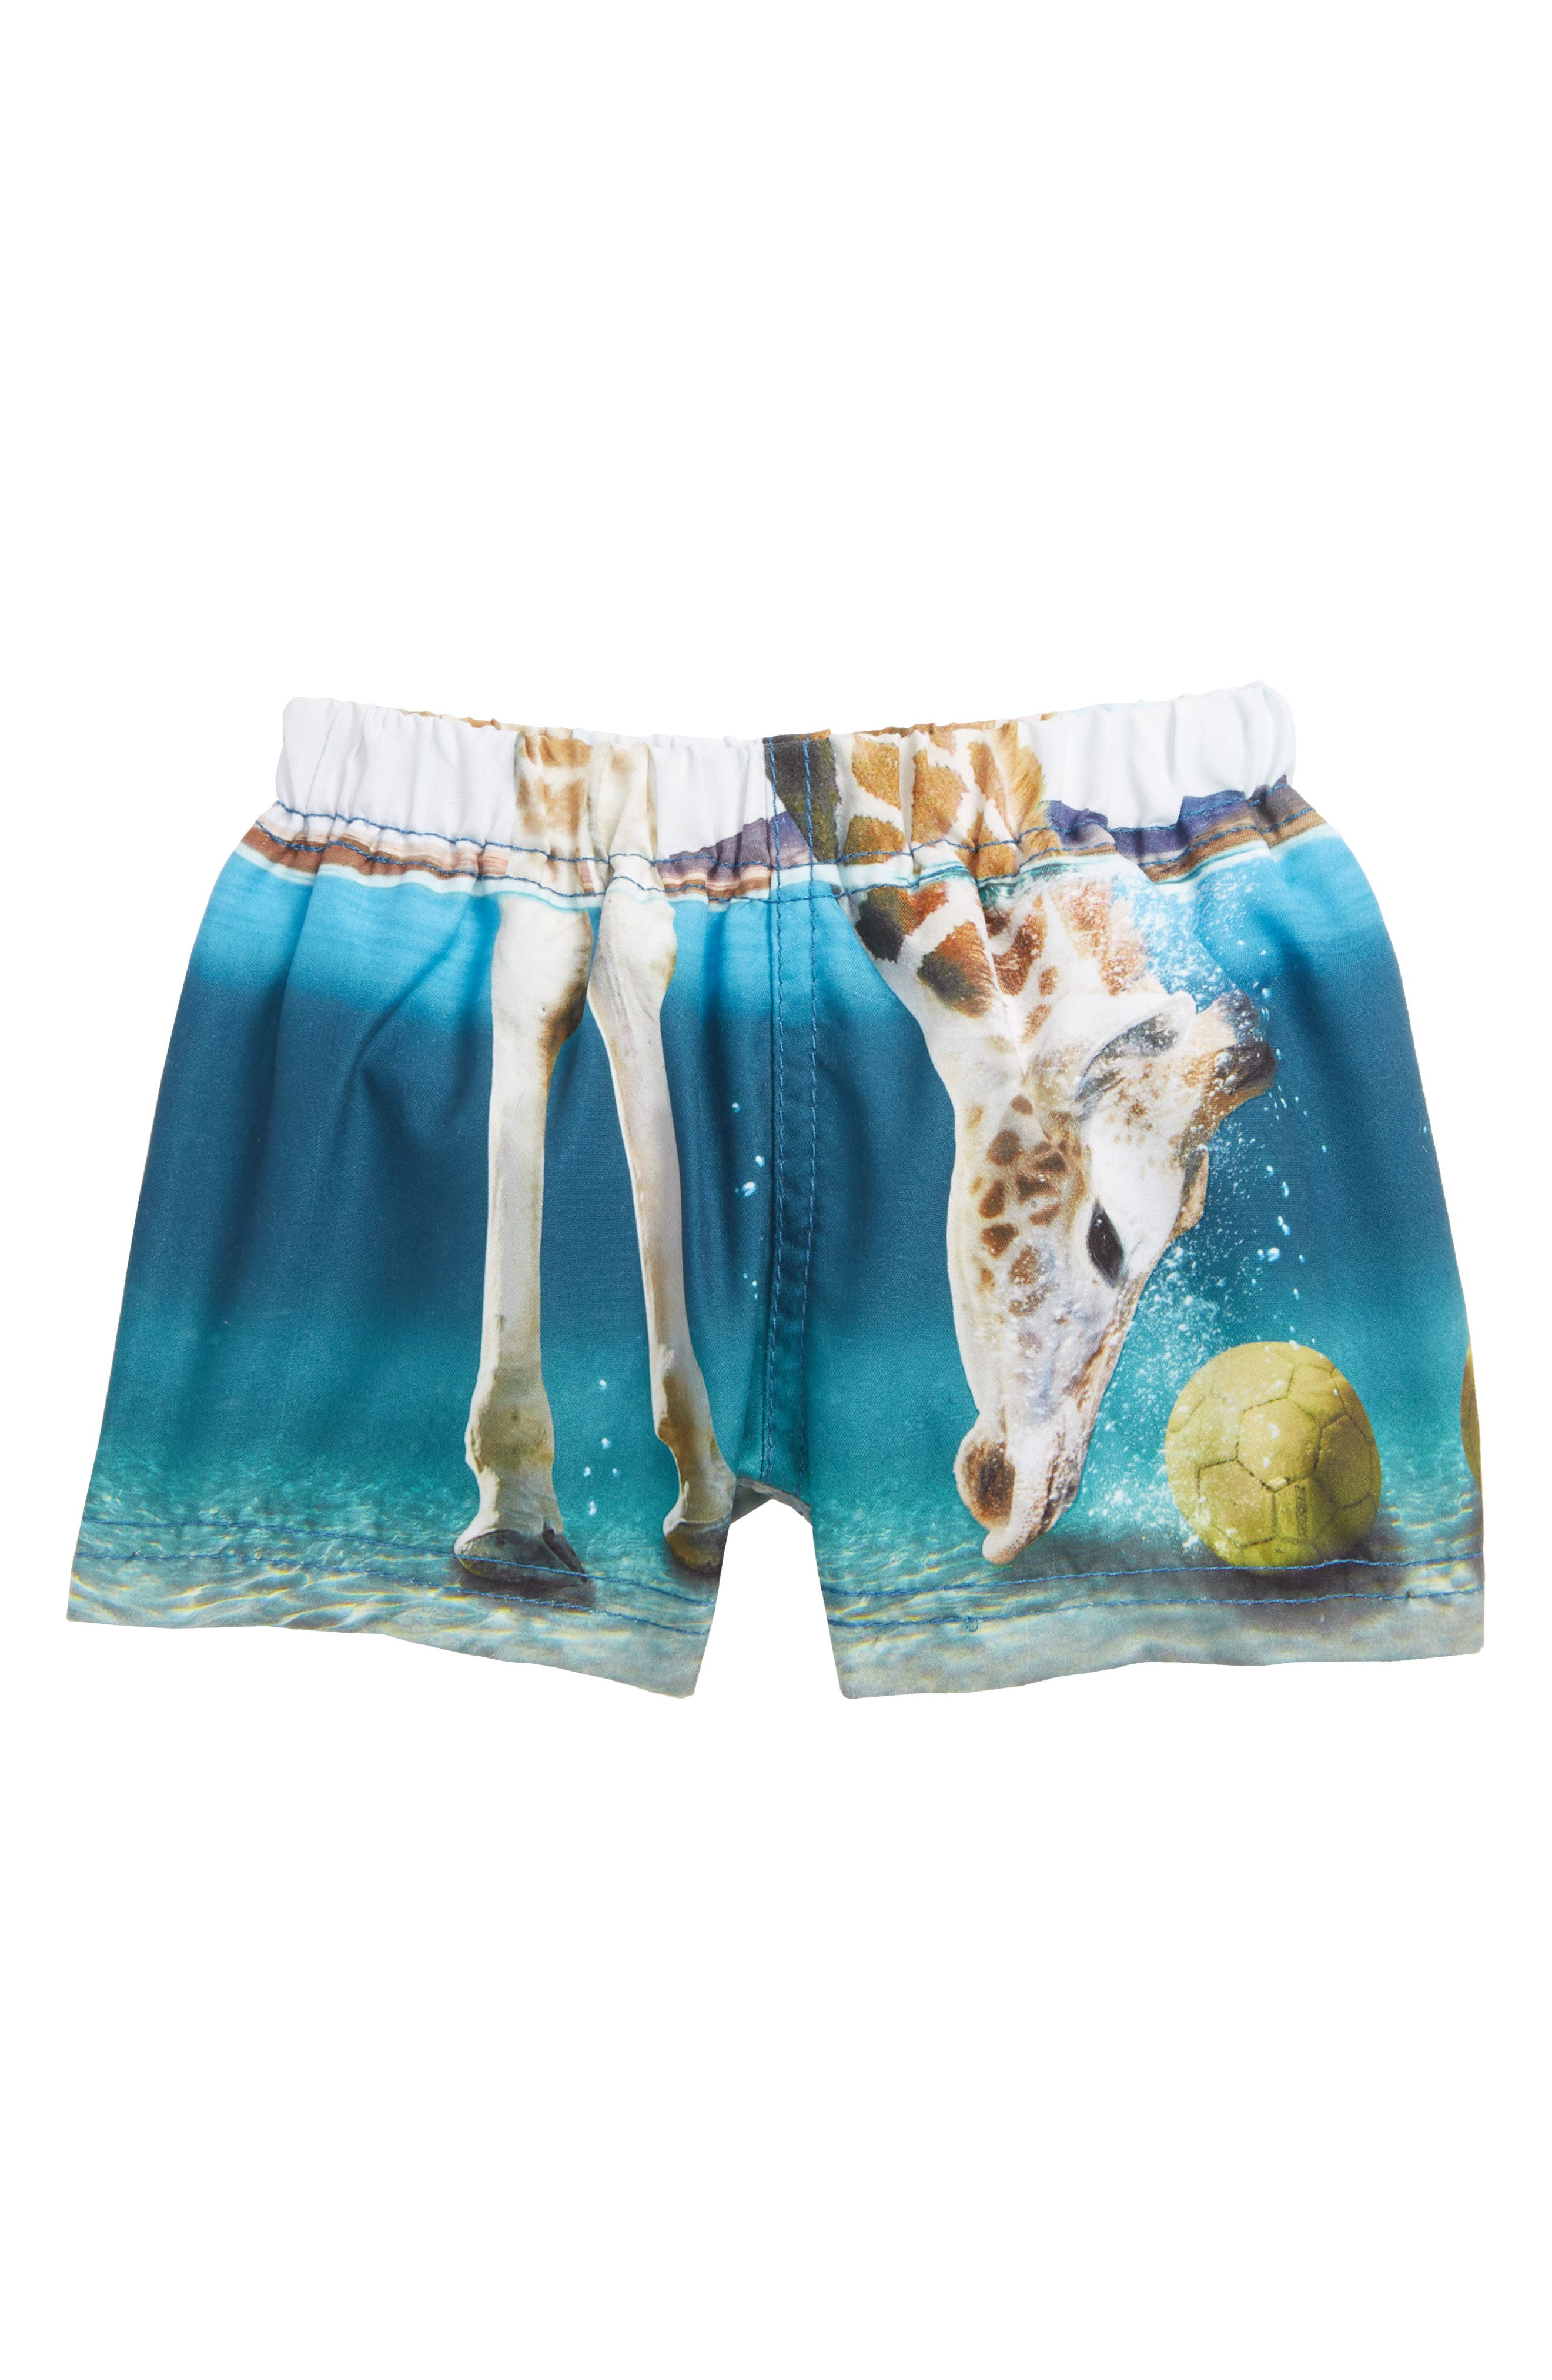 Newton Swim Trunks,                         Main,                         color,